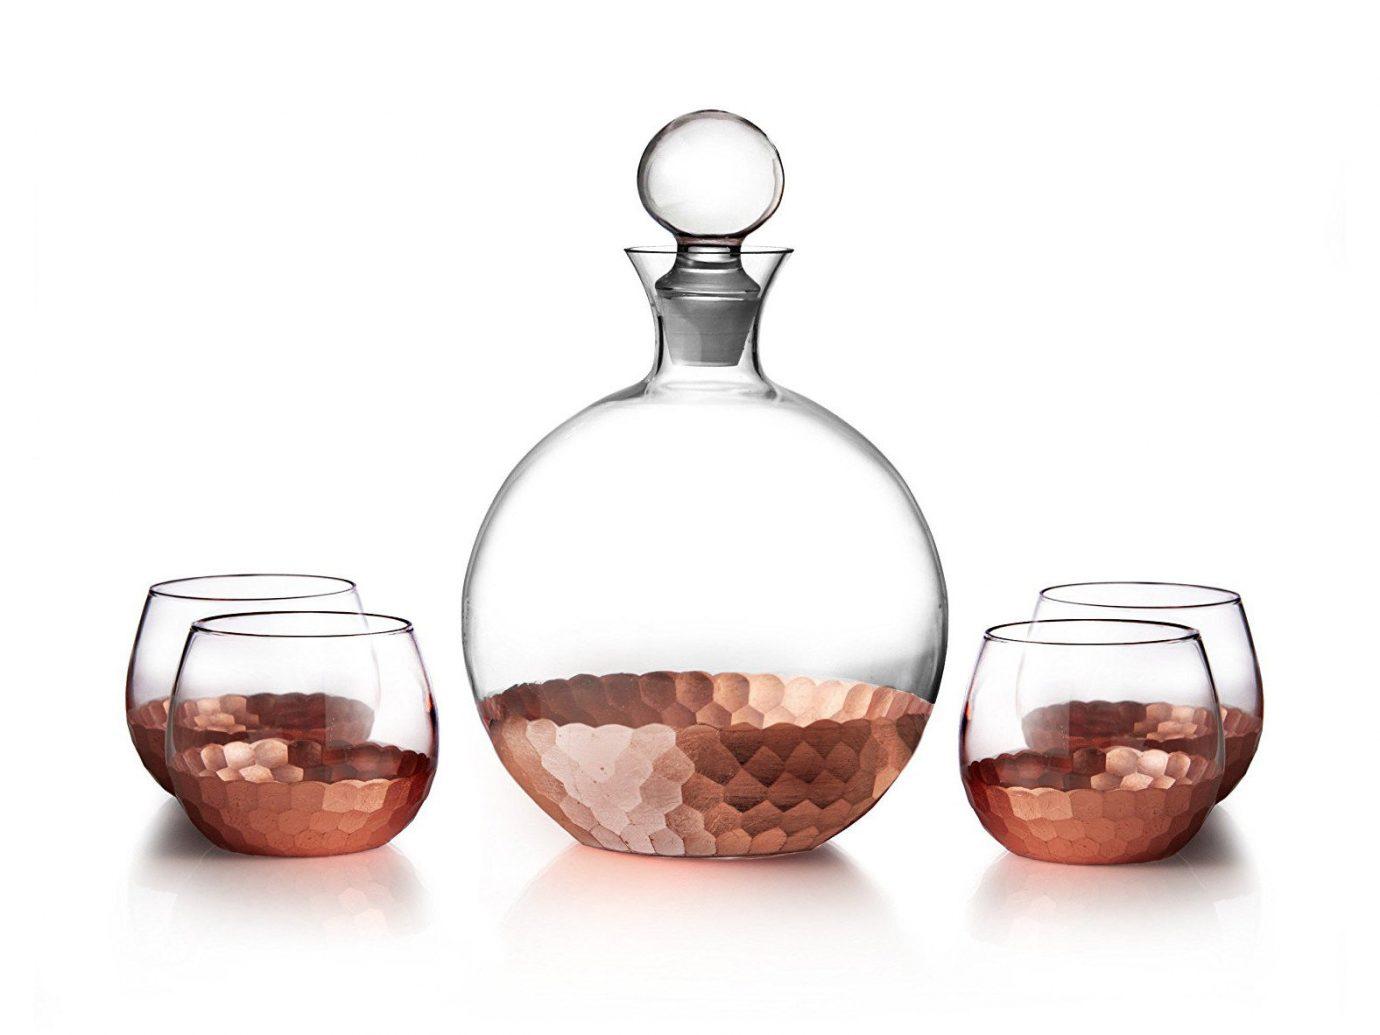 Travel Shop indoor sitting product tableware decanter product design glass barware glass bottle serveware